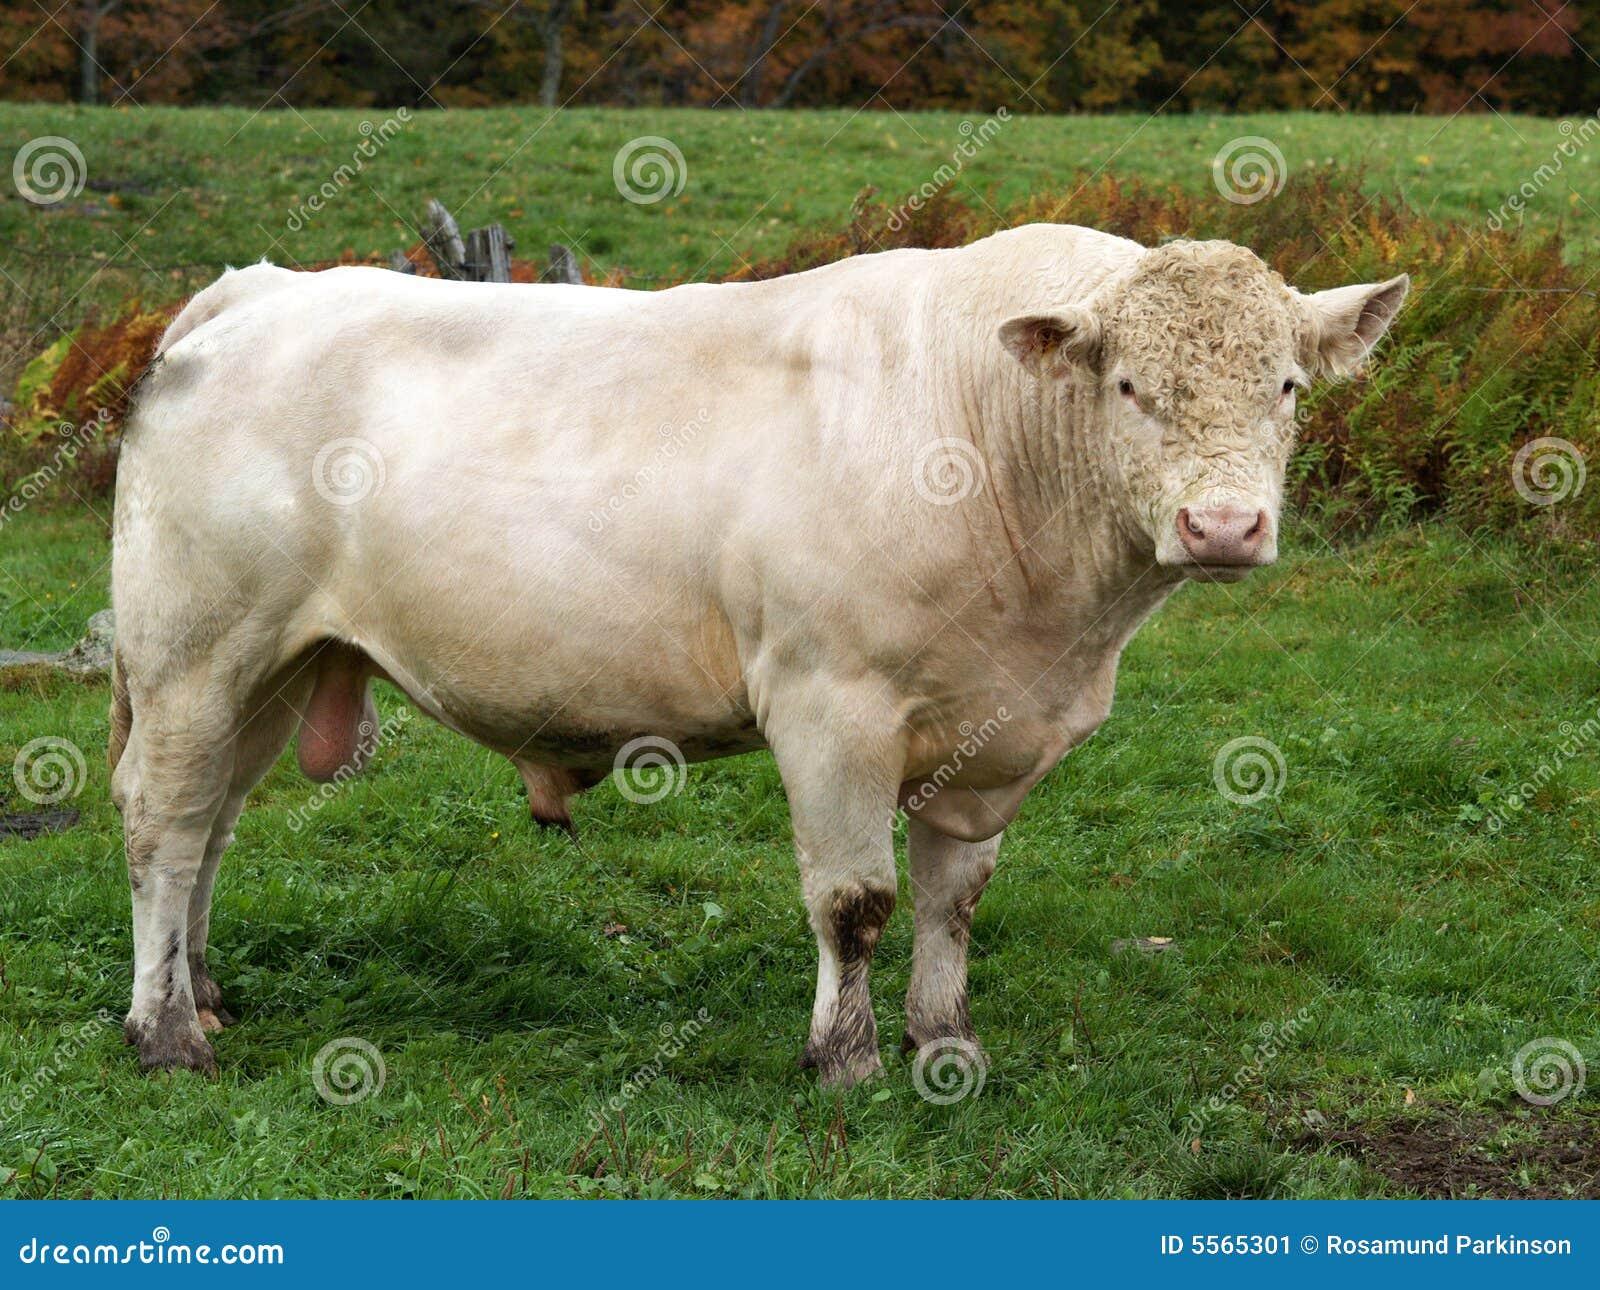 White Bull Stock Image - Image: 5565301